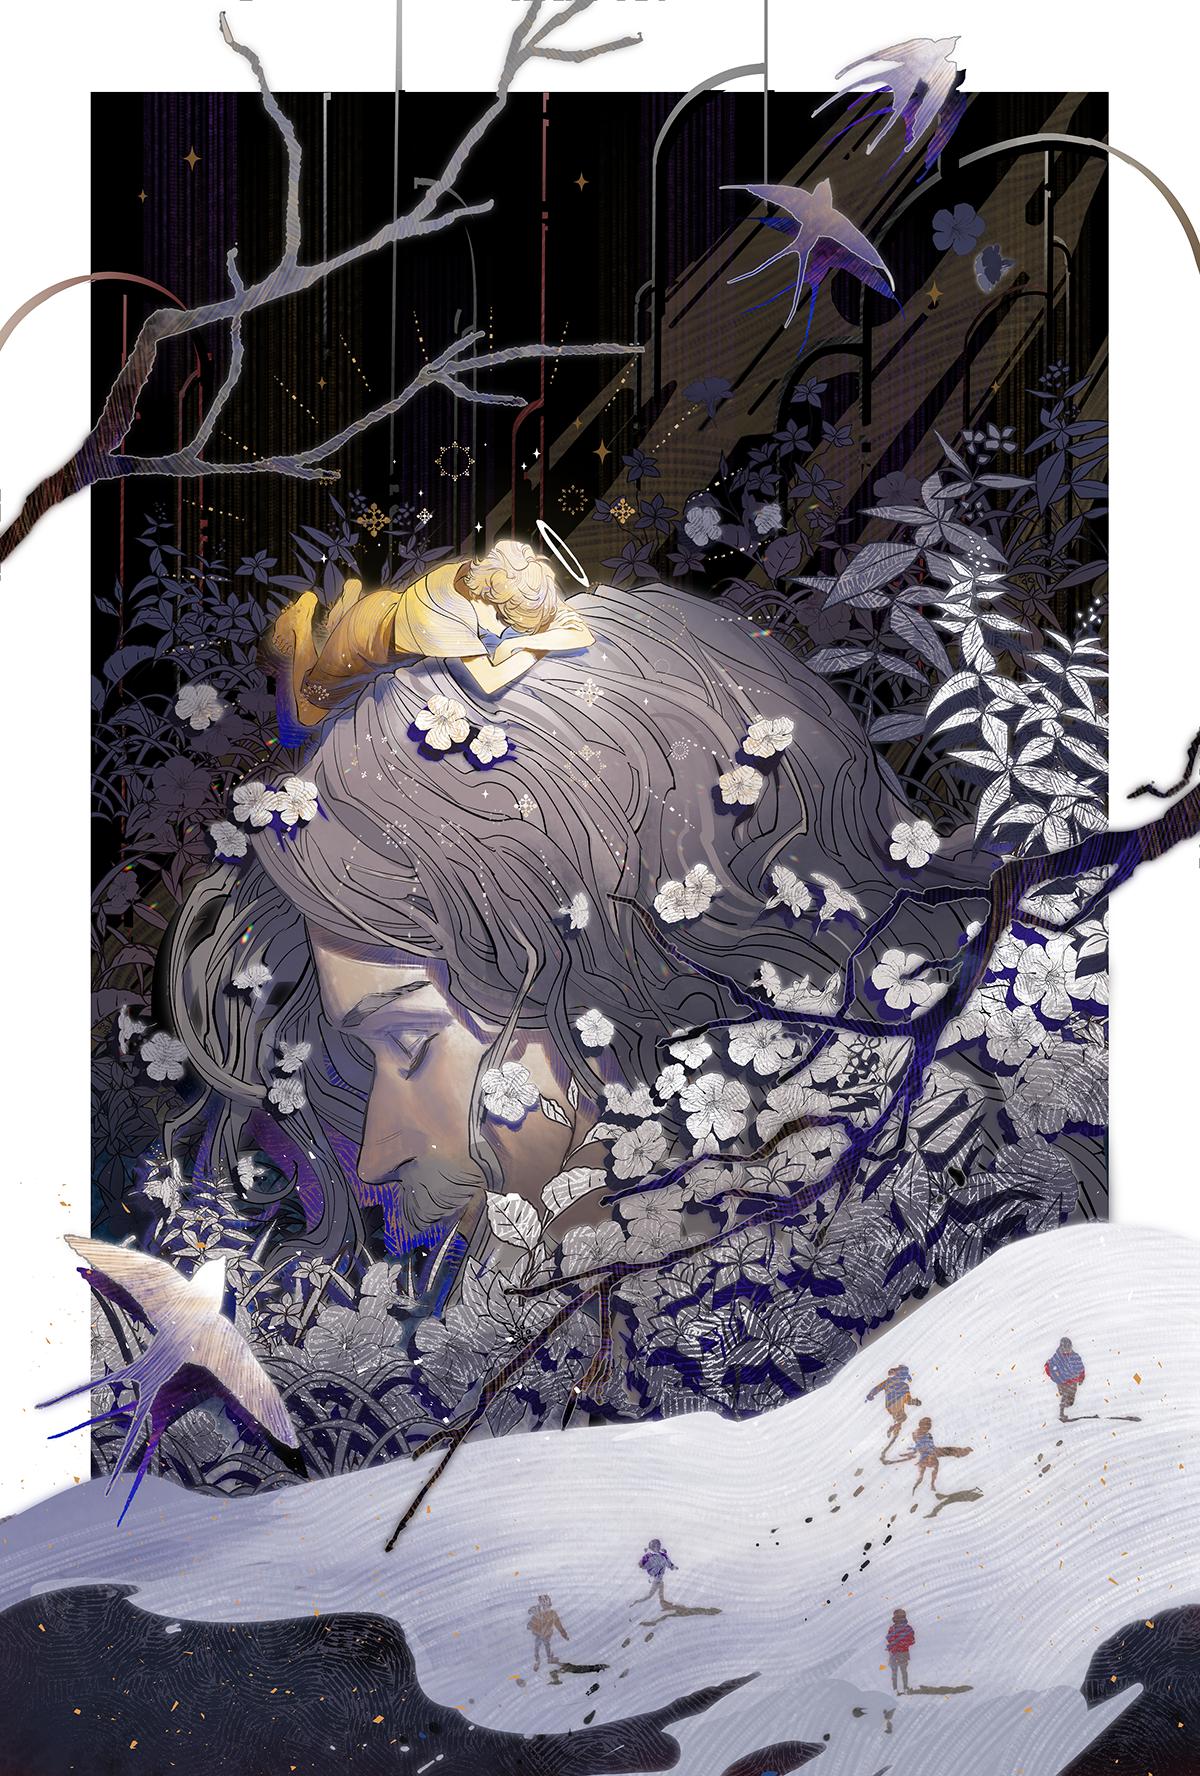 GirlsclubAsia-Artist-Kiuyan Ran-wilde (2)